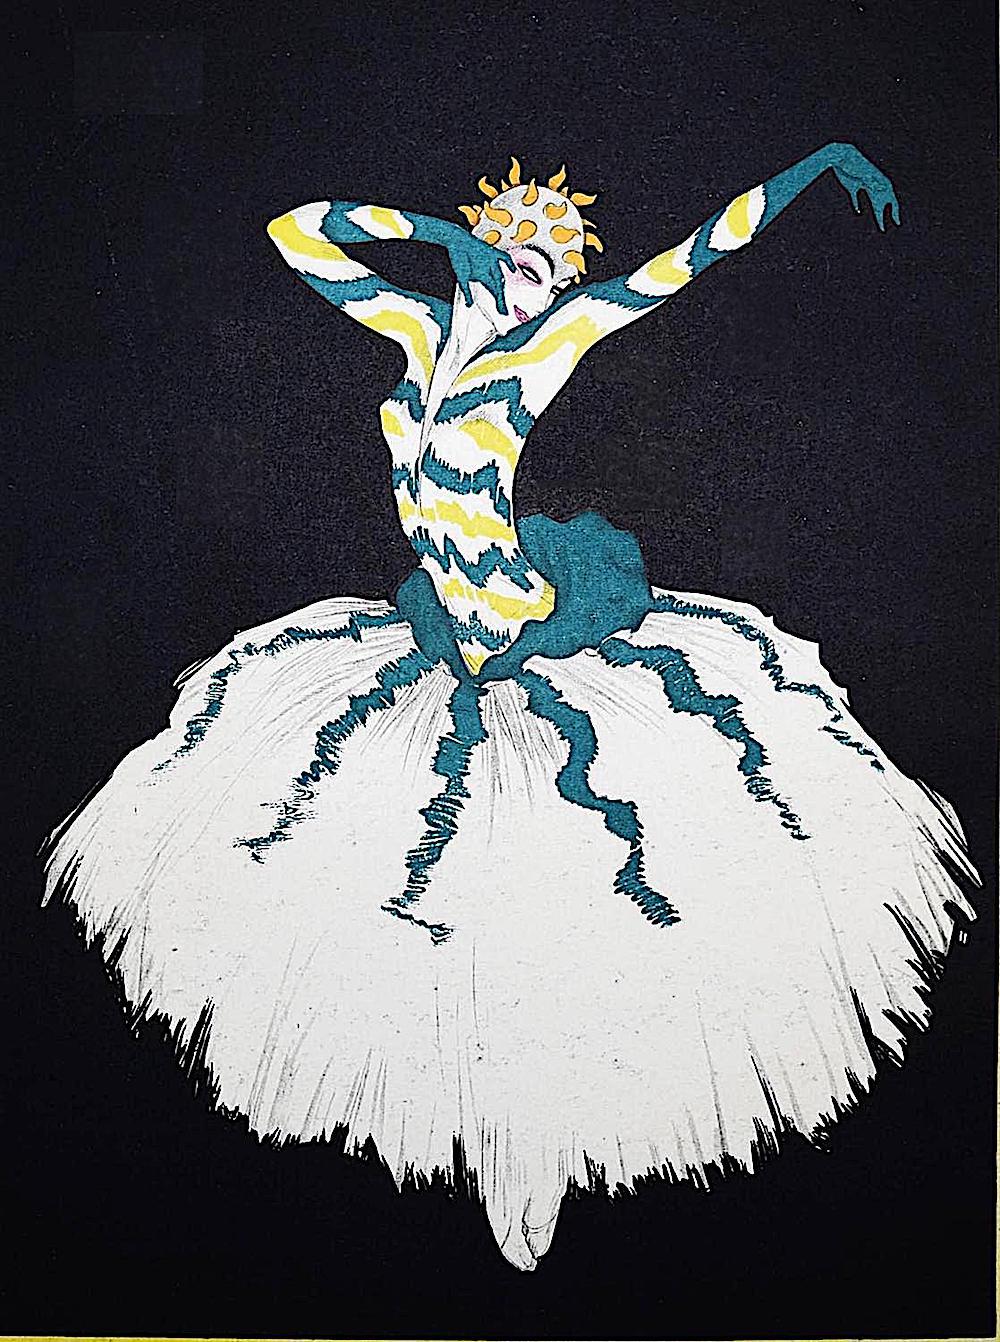 Walter Schnackenberg, a dark ominous dancer